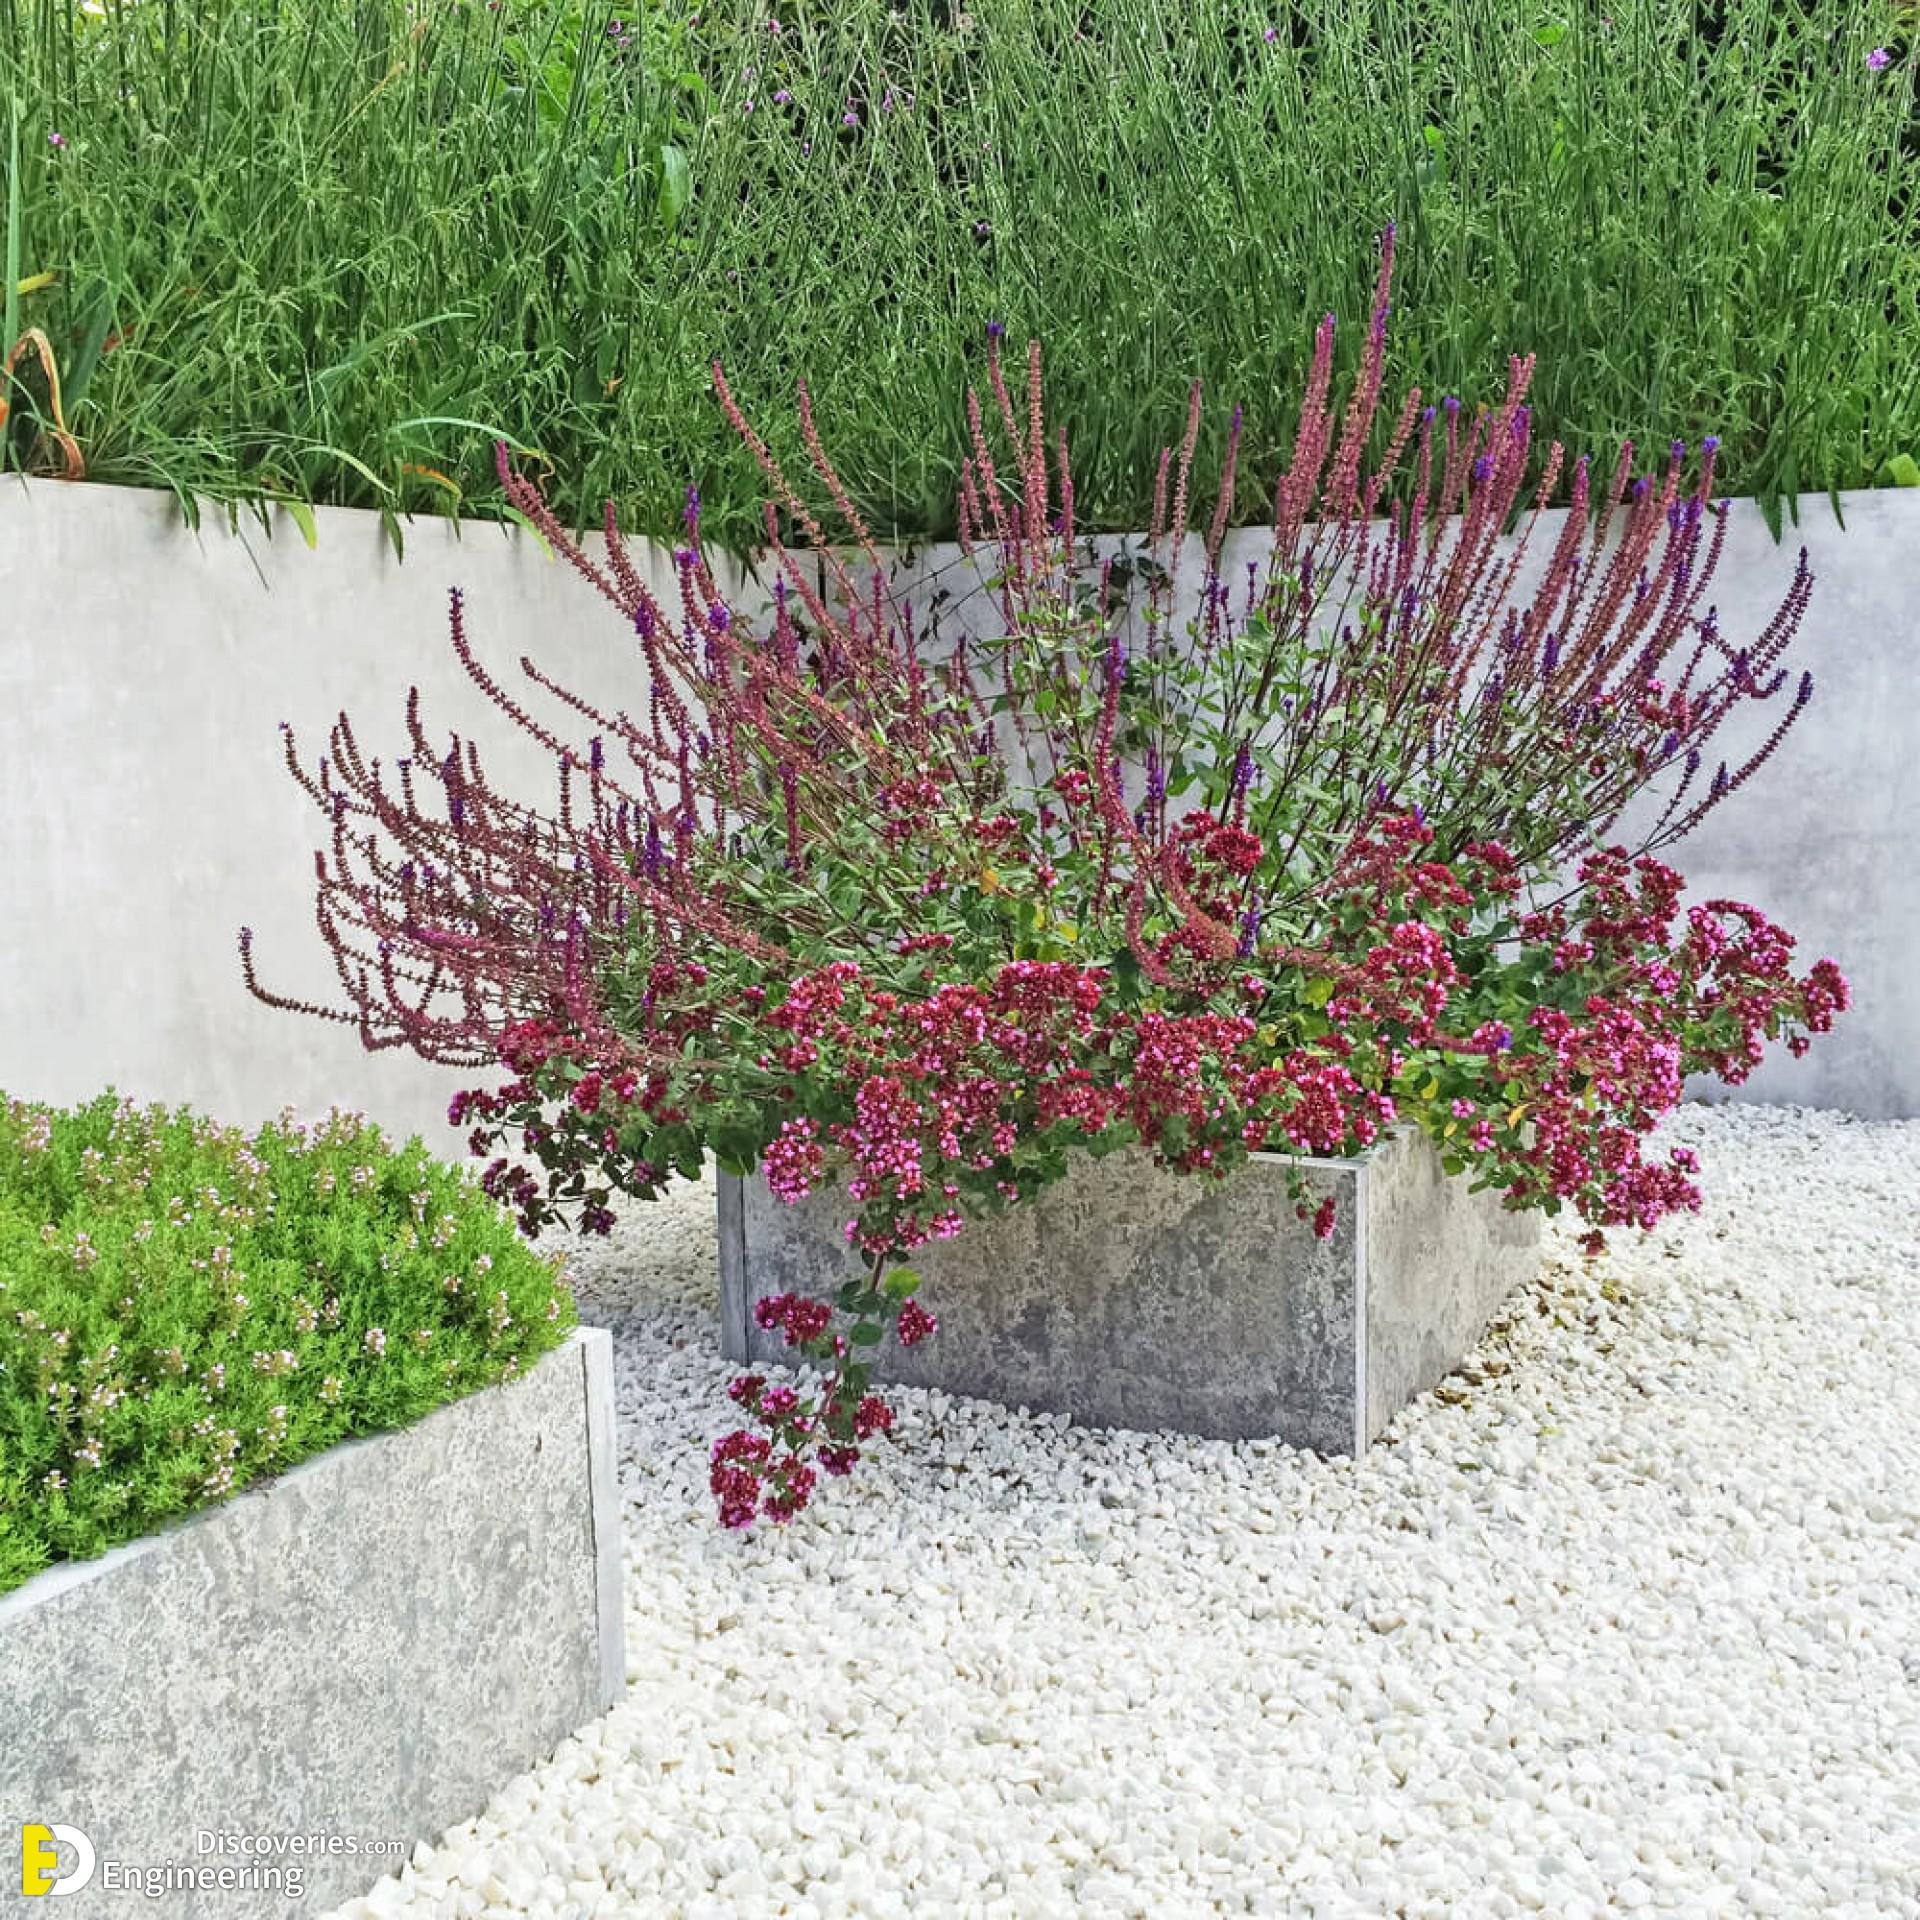 20 Eye Catching DIY Garden Ideas Of Rocks And Pots You ...